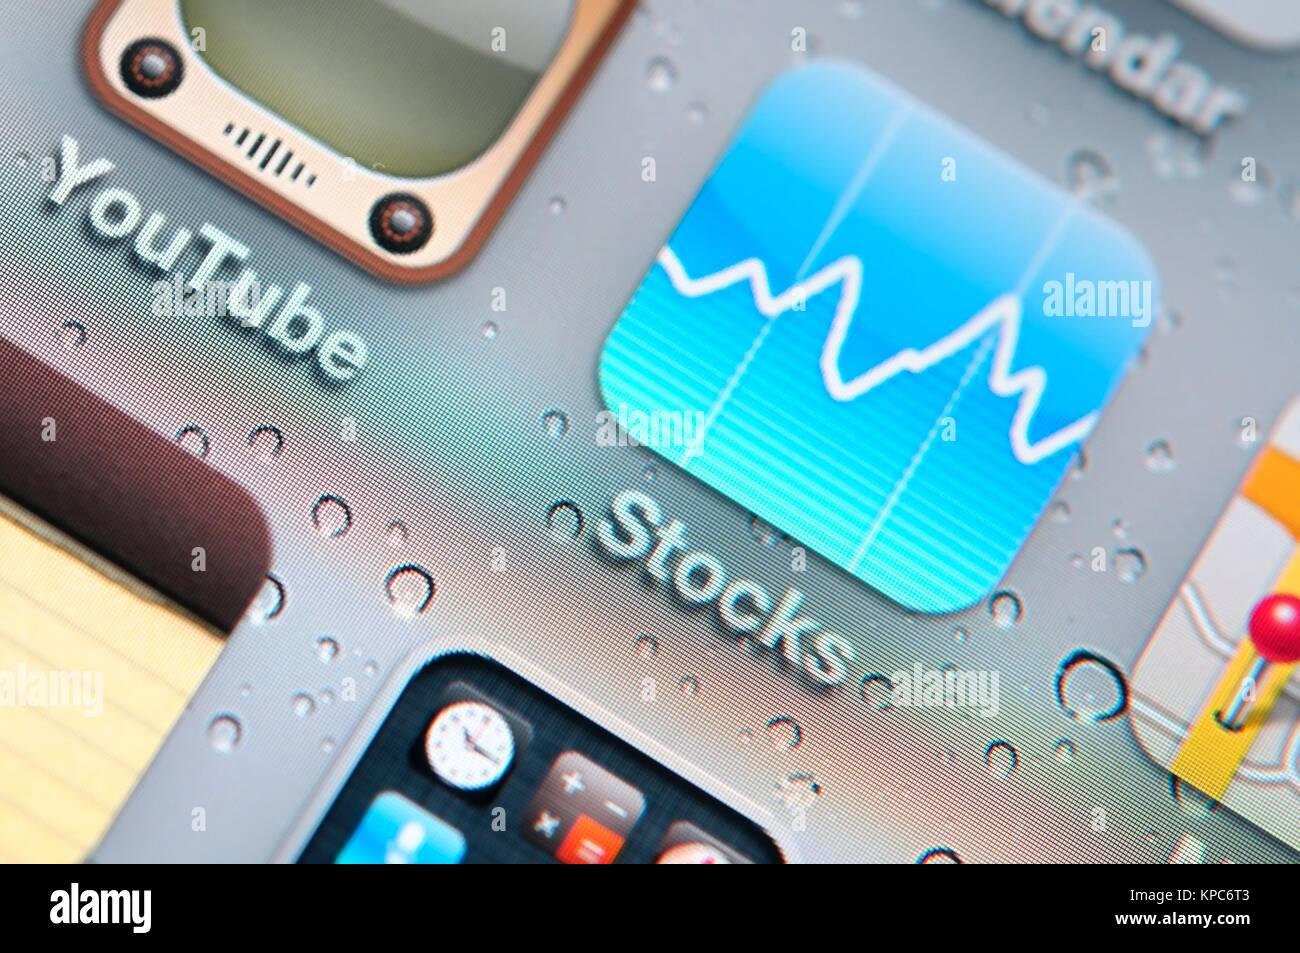 Macro shot of stock icon on lcd display. - Stock Image